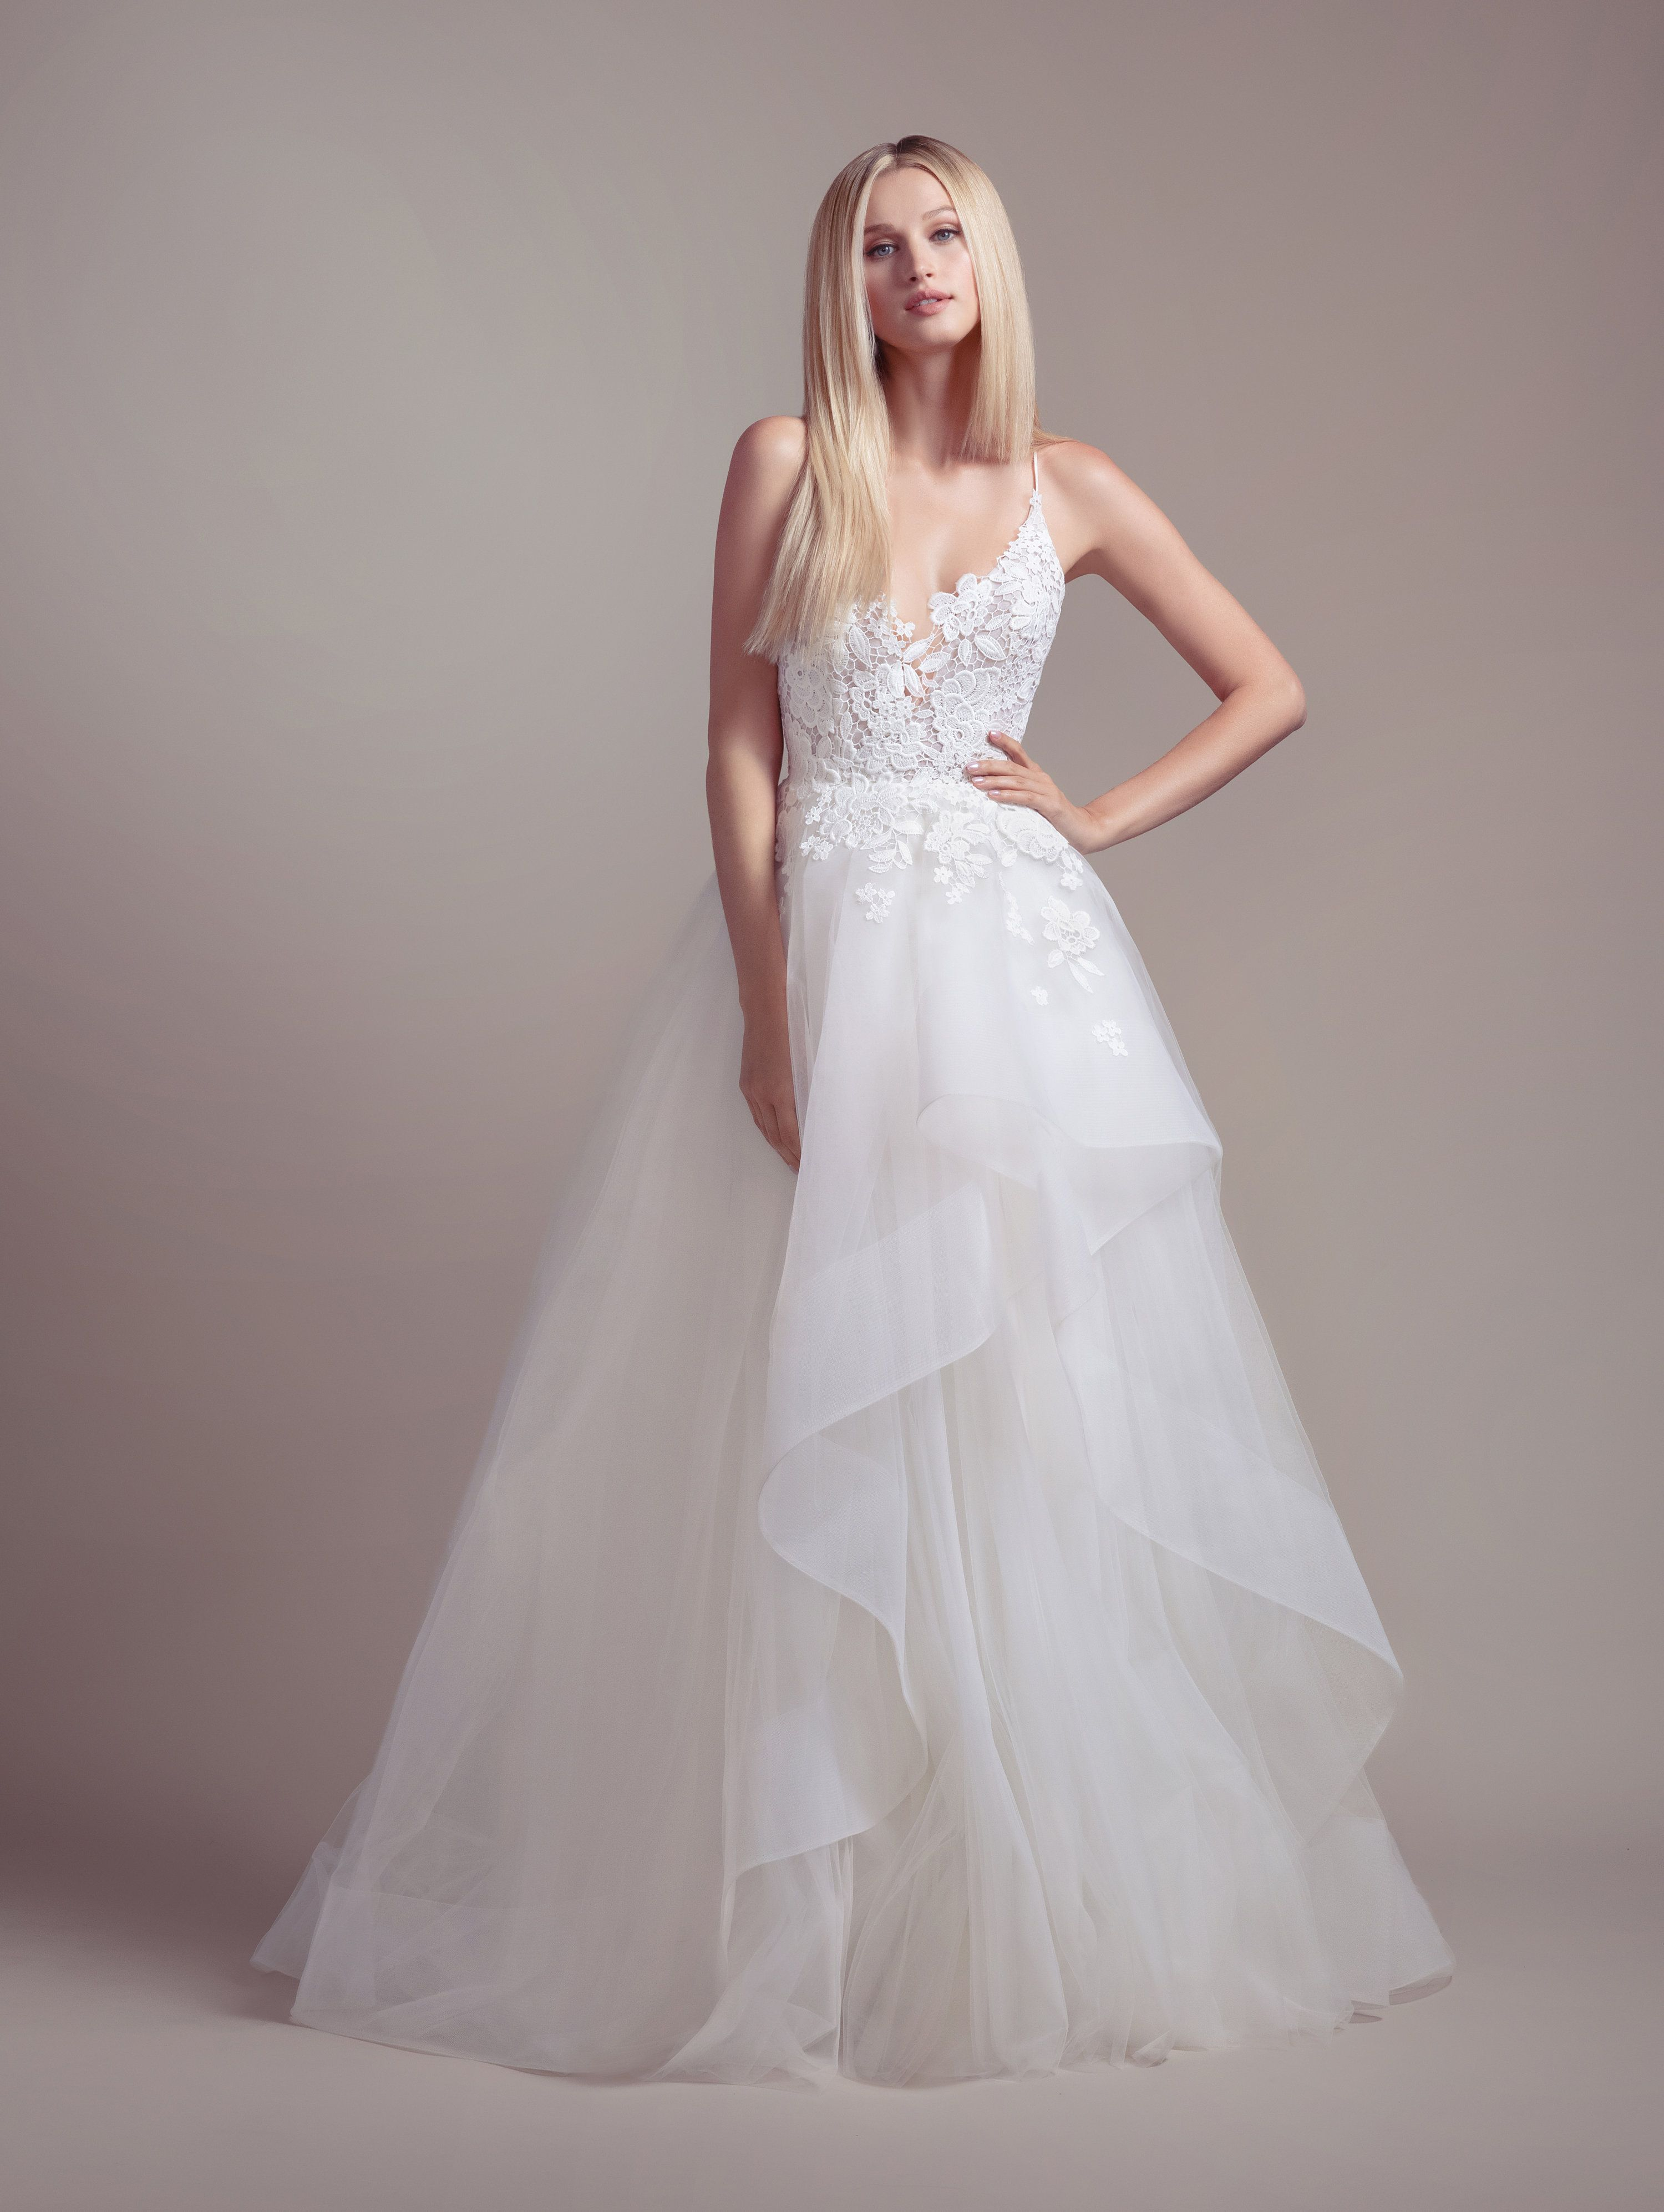 Lace Bodice Spaghetti Strap Ball Gown Wedding Dress Wedding